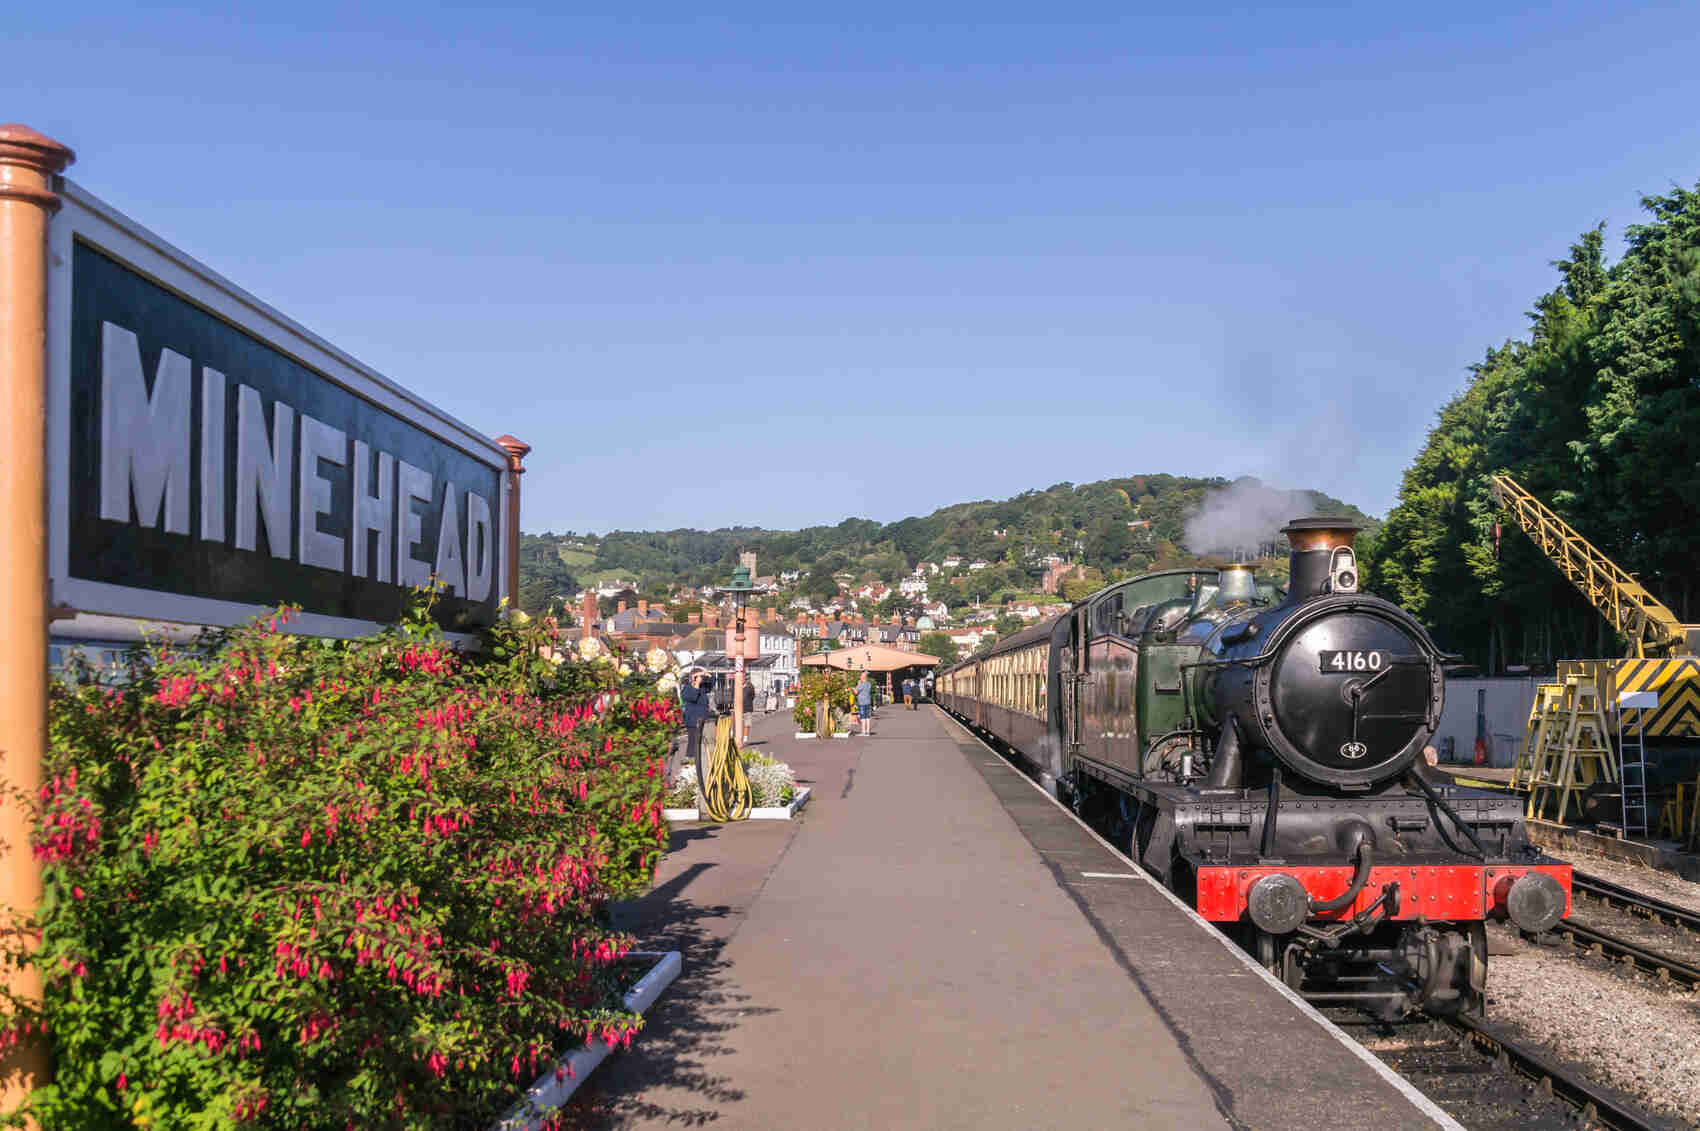 Minehead-station-Somerset